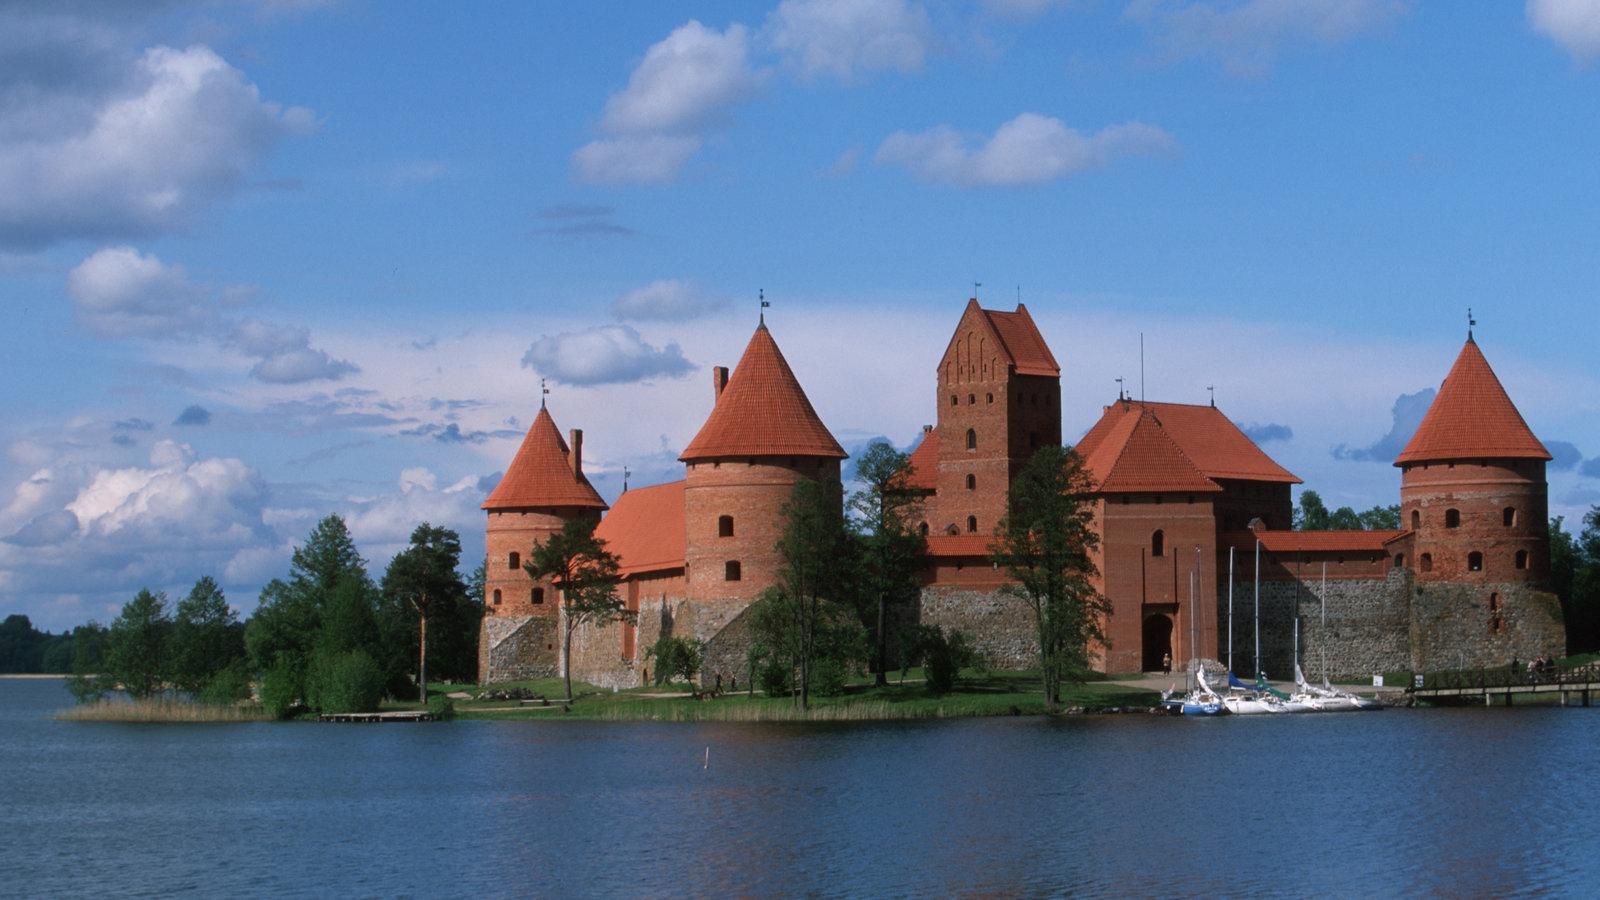 baltische staaten litauen baltische staaten kultur planet wissen. Black Bedroom Furniture Sets. Home Design Ideas